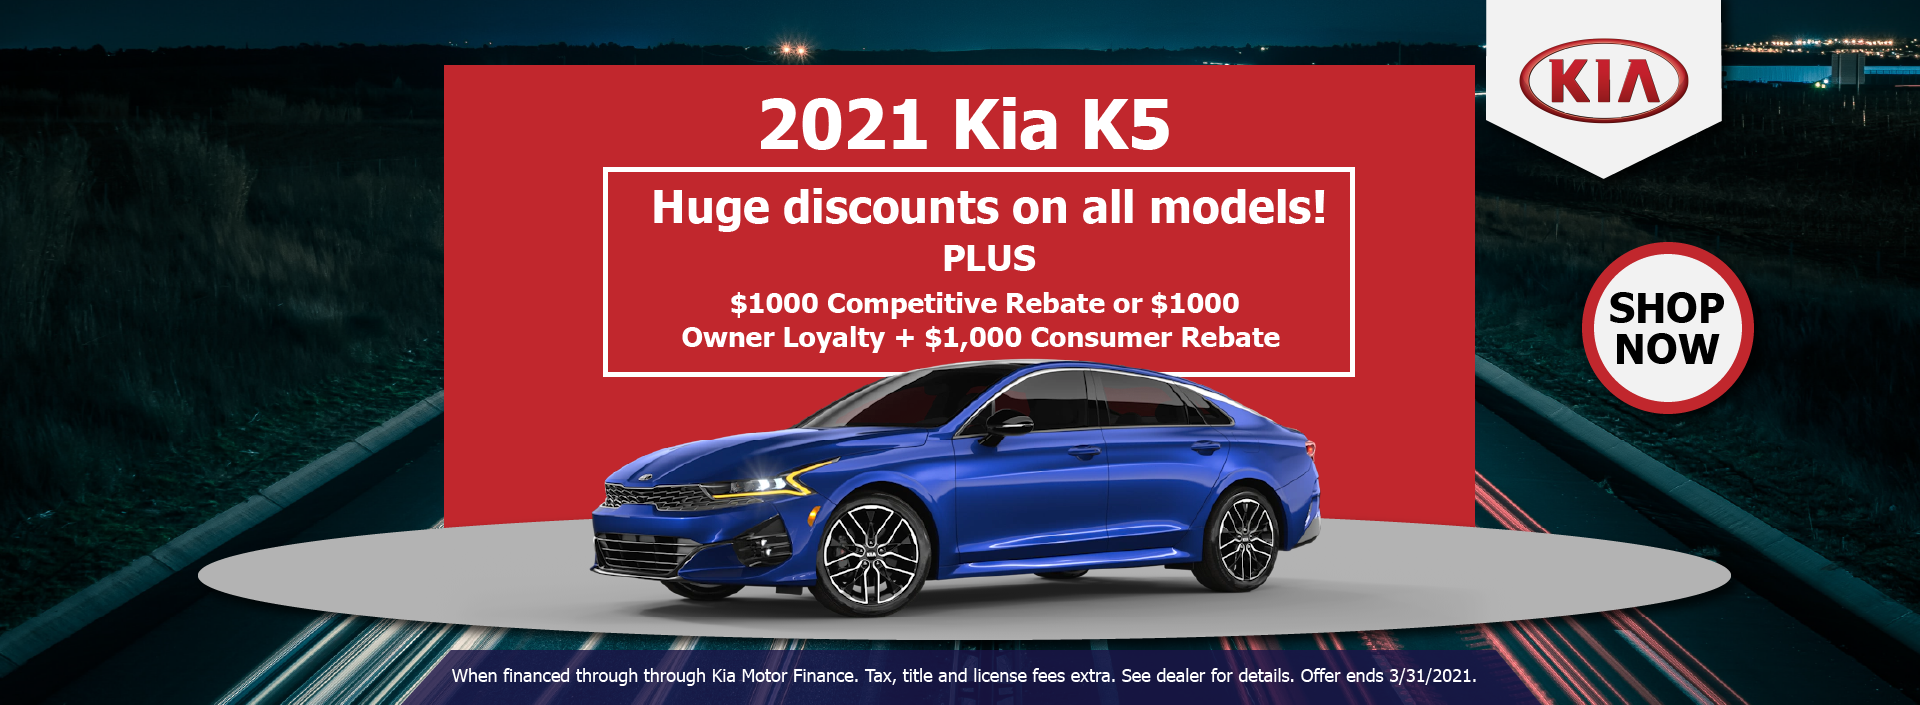 2021 Kia K5 March